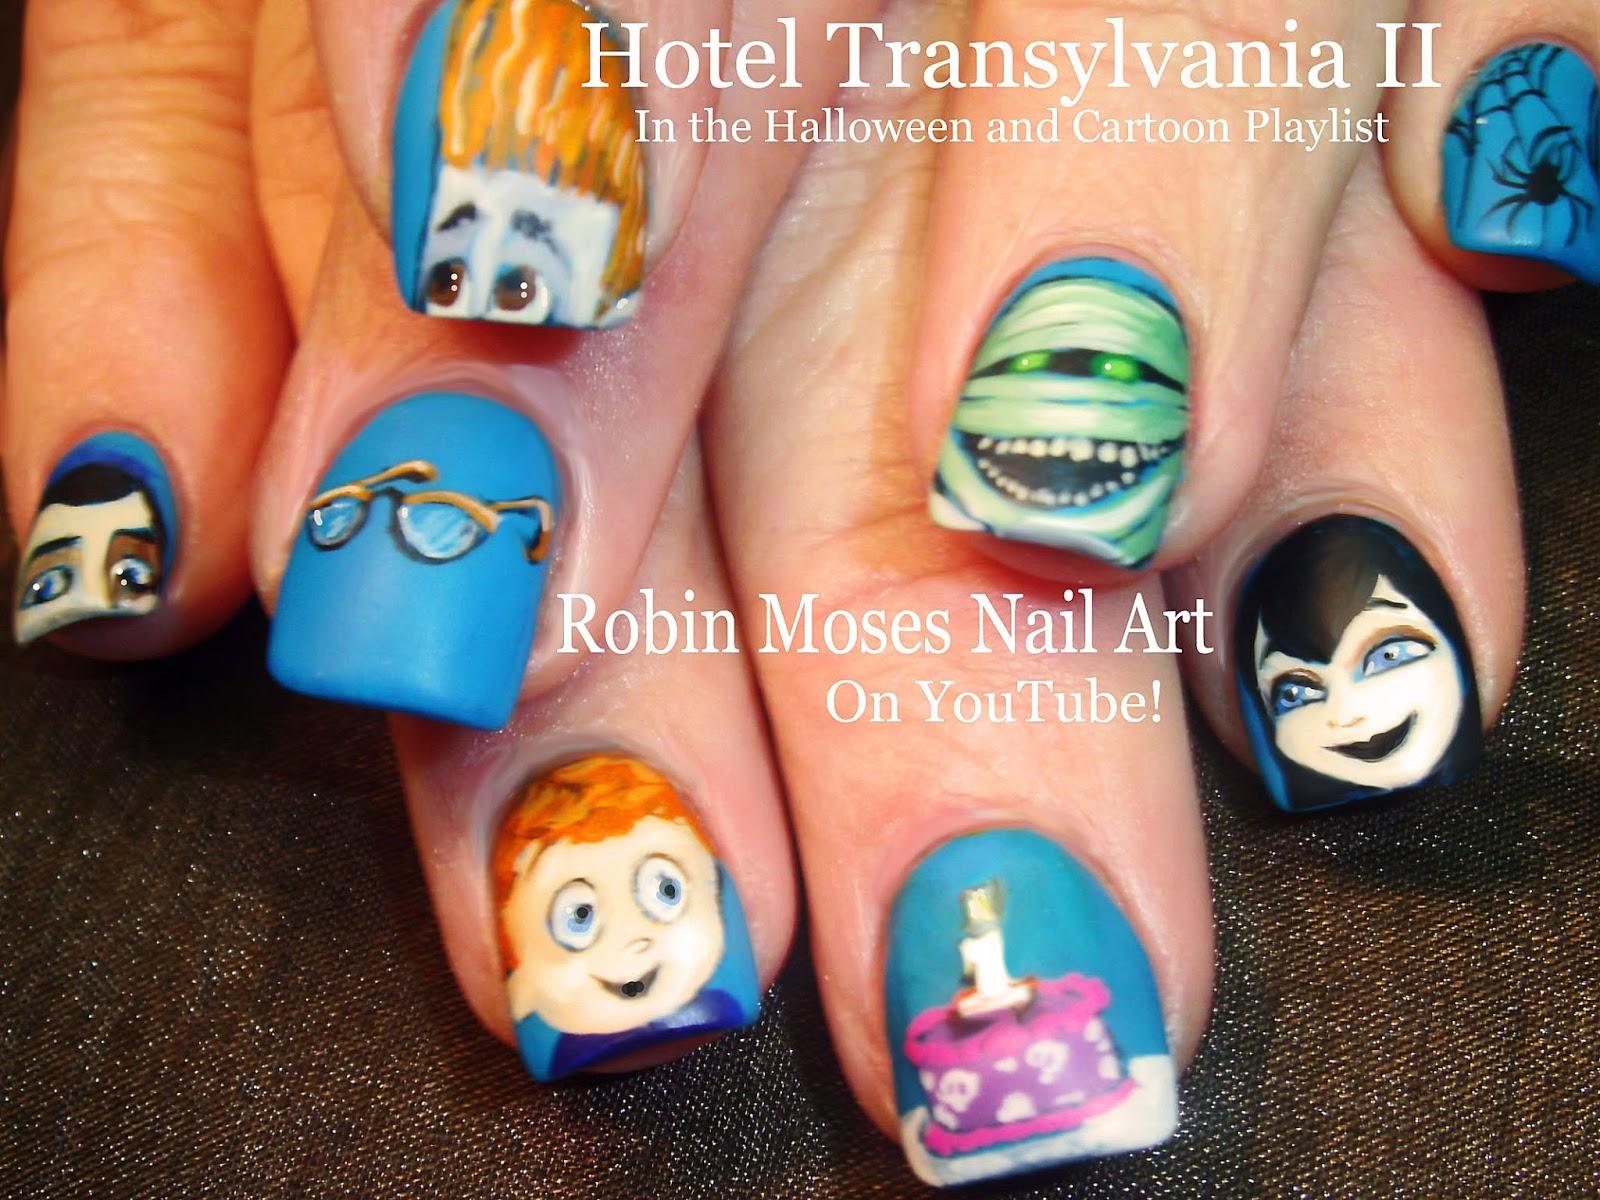 Robin moses nail art hotel transylvania 2 nails hotel hotel transylvania 2 nail art in both the halloween nail art playlist and the cartoon playlist both linked below prinsesfo Images